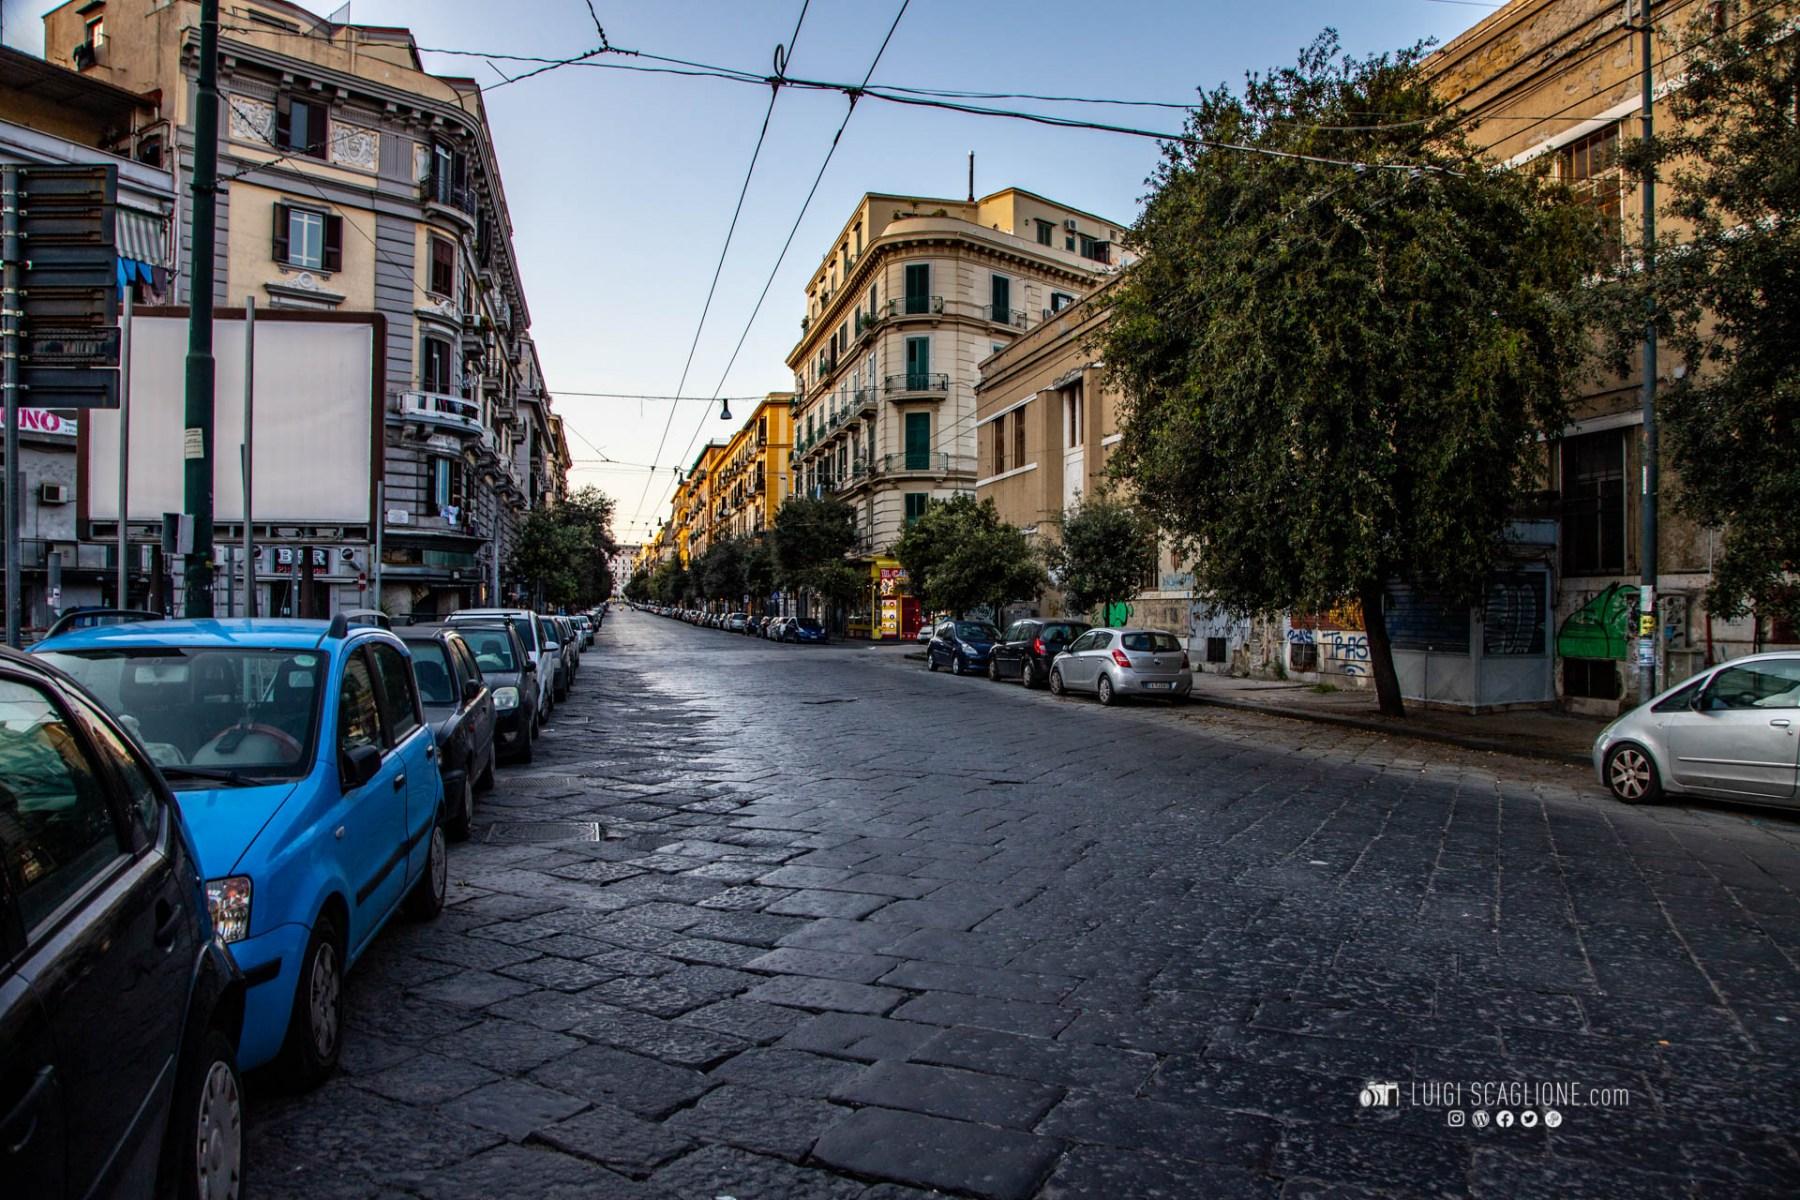 Corso Garibaldi